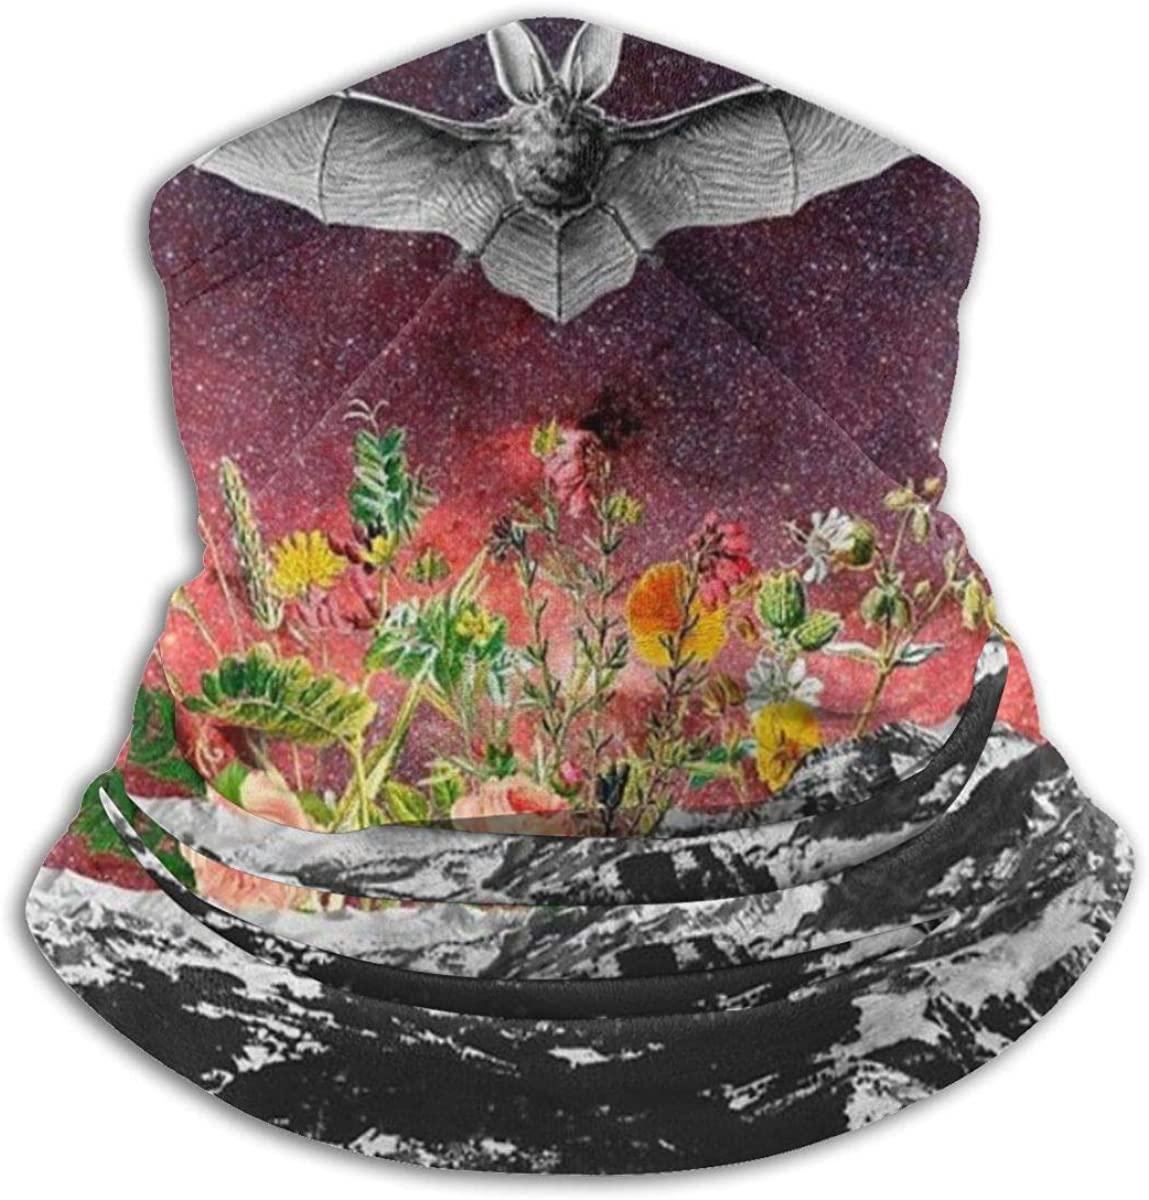 QBahoe Space Bat Flowers Galxy Unisex Fleece Neck Gaiter Warmer Winter Windproof Ski Face Mask Balaclava Half Mask for Women Men